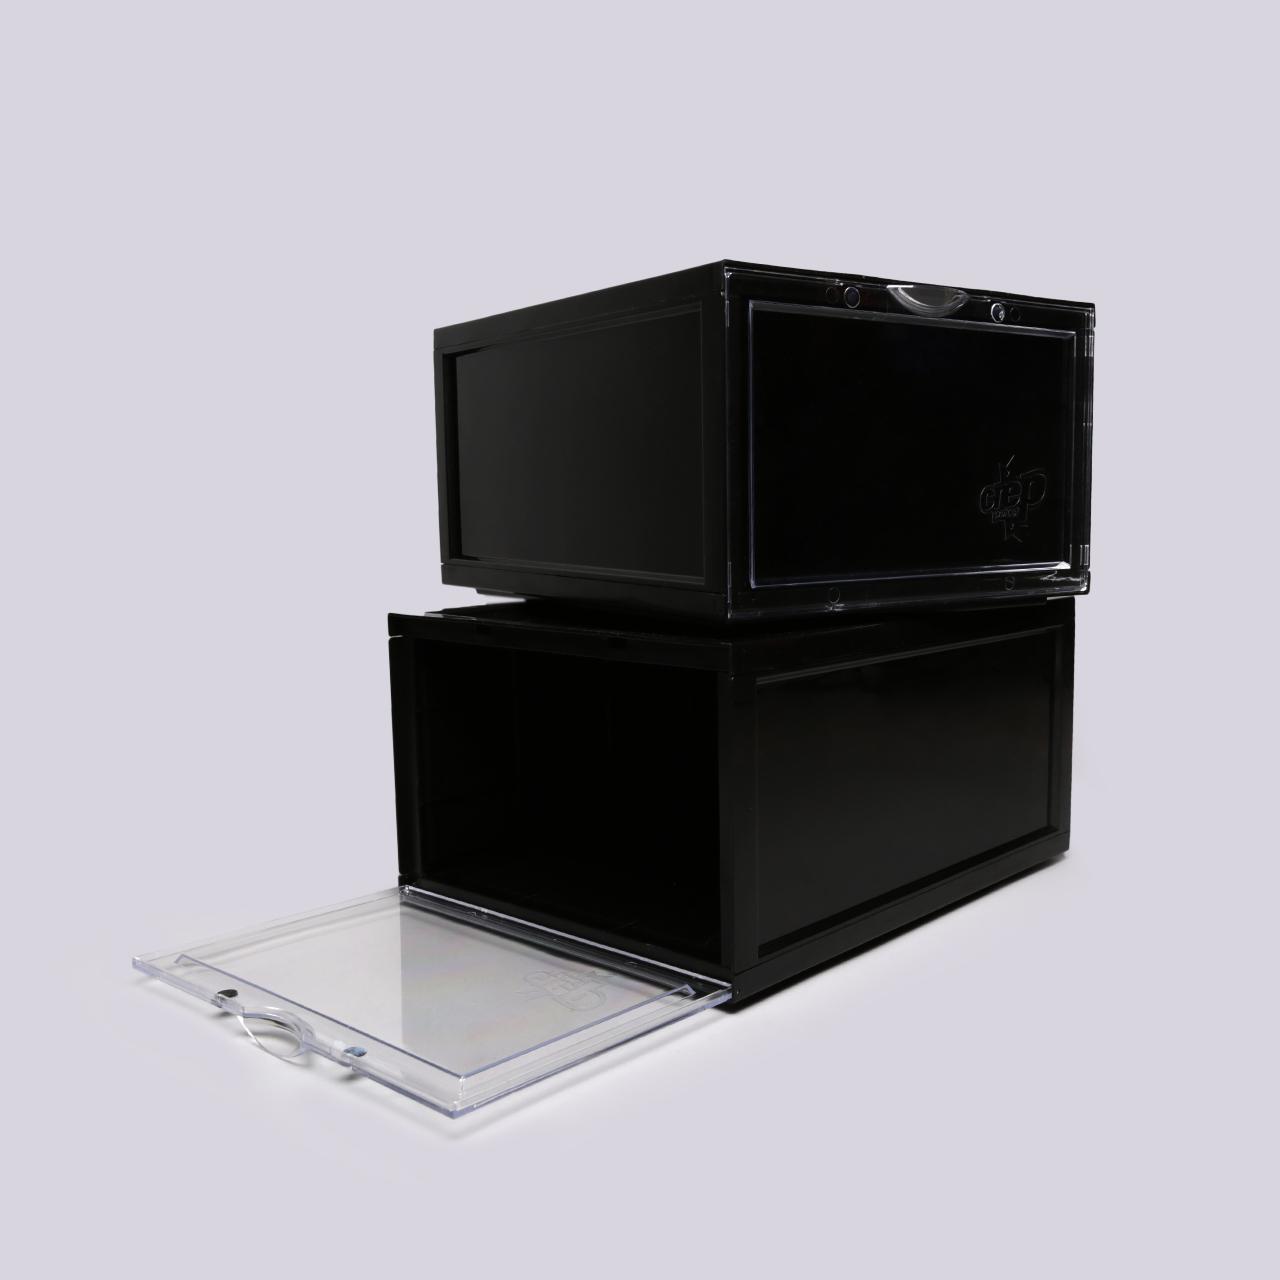 Коробки Для Хранения Обуви Crep Protect The Ultimate Crates